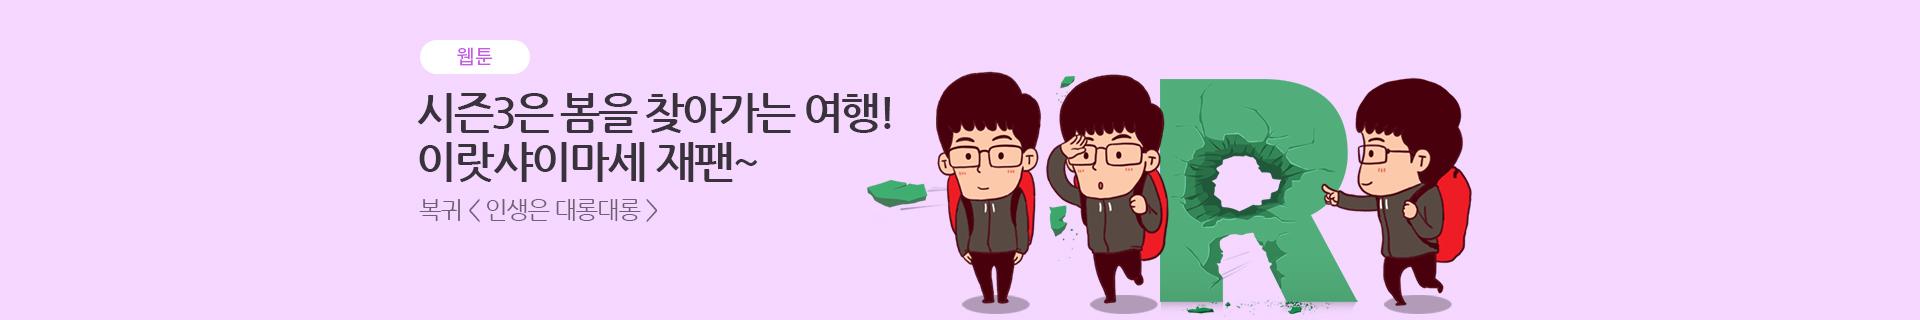 PC_sub_bn_웹툰복귀_인생은대롱대롱_1920x320_(2).jpg